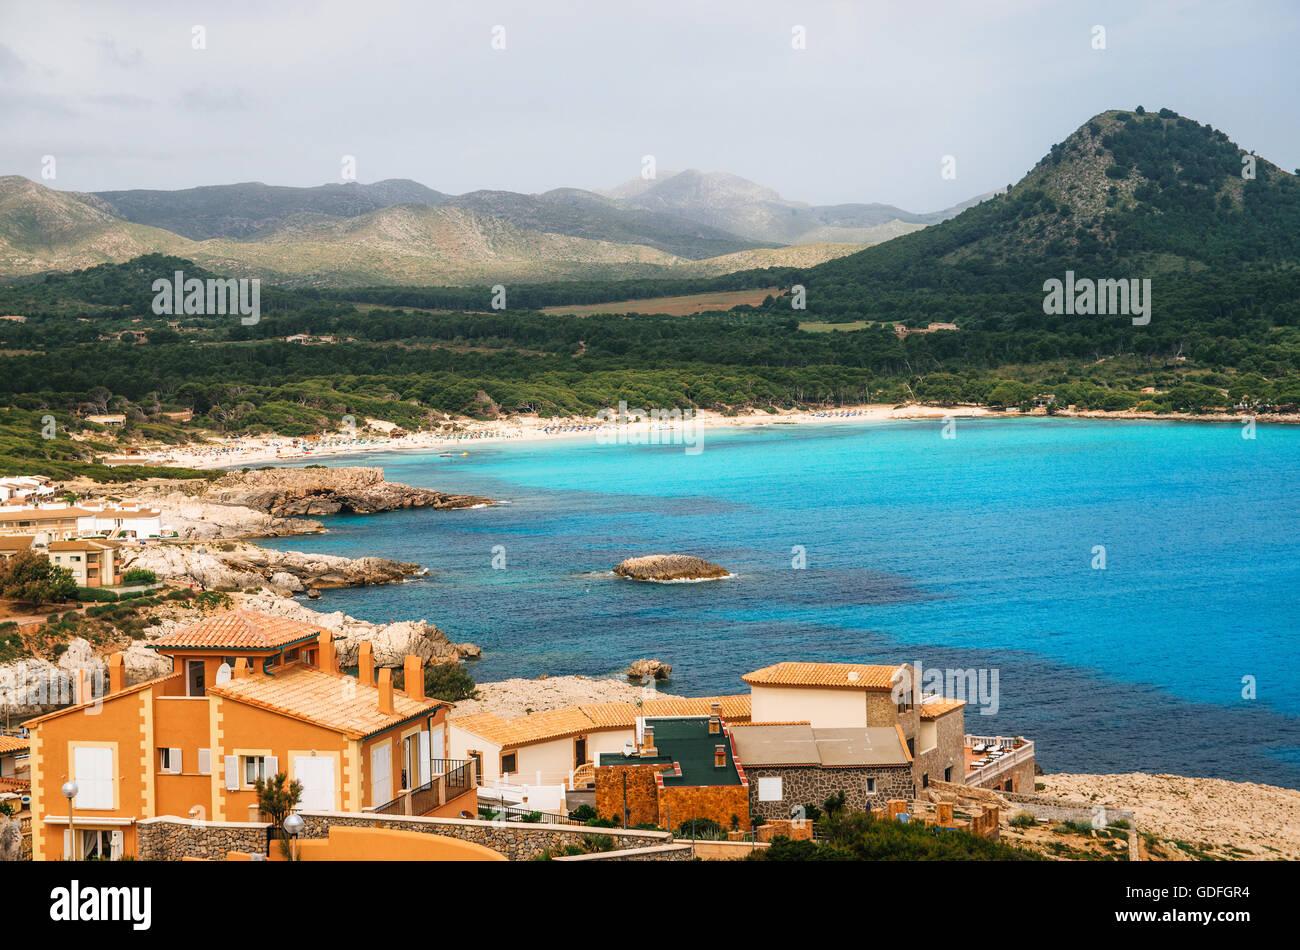 View of the Cala Agulla Beach in Mallorca island, Spain. Beautiful landscape with Es Pelats village, whitesand beach, - Stock Image